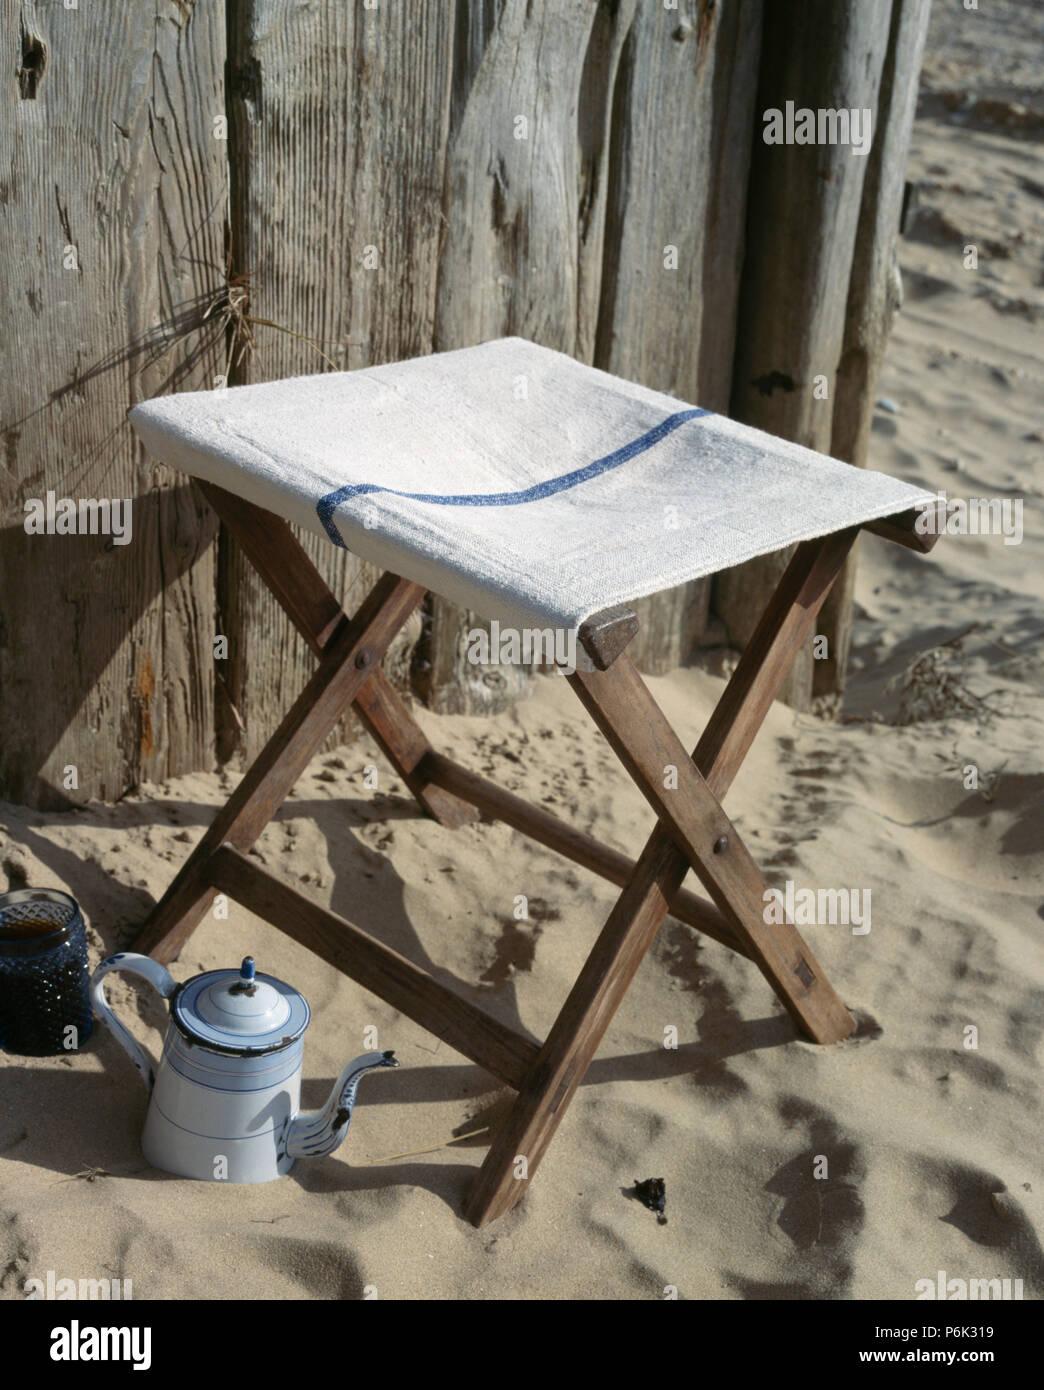 Tremendous Enamel Coffeepot On Sand Beside Canvas And Wood Folding Camellatalisay Diy Chair Ideas Camellatalisaycom